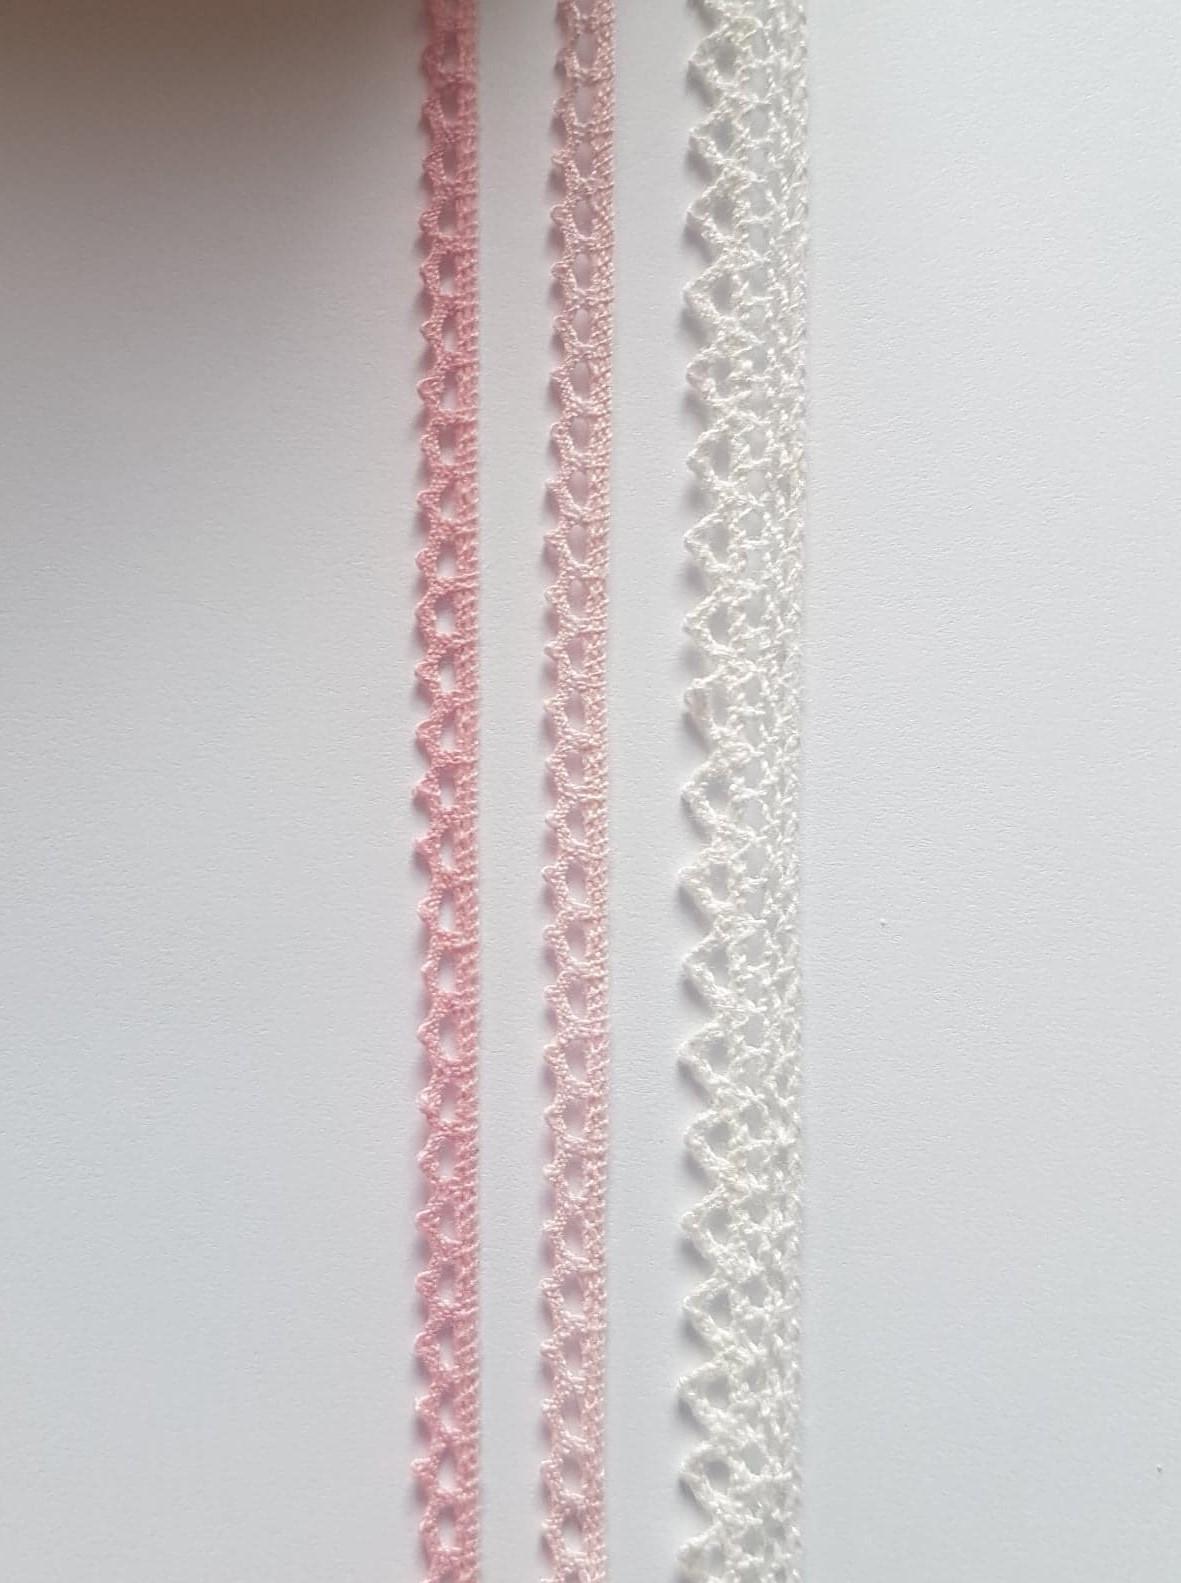 bavlnena cipka s. 12 mm biela a 7 mm ruzova - Obrázok č. 1